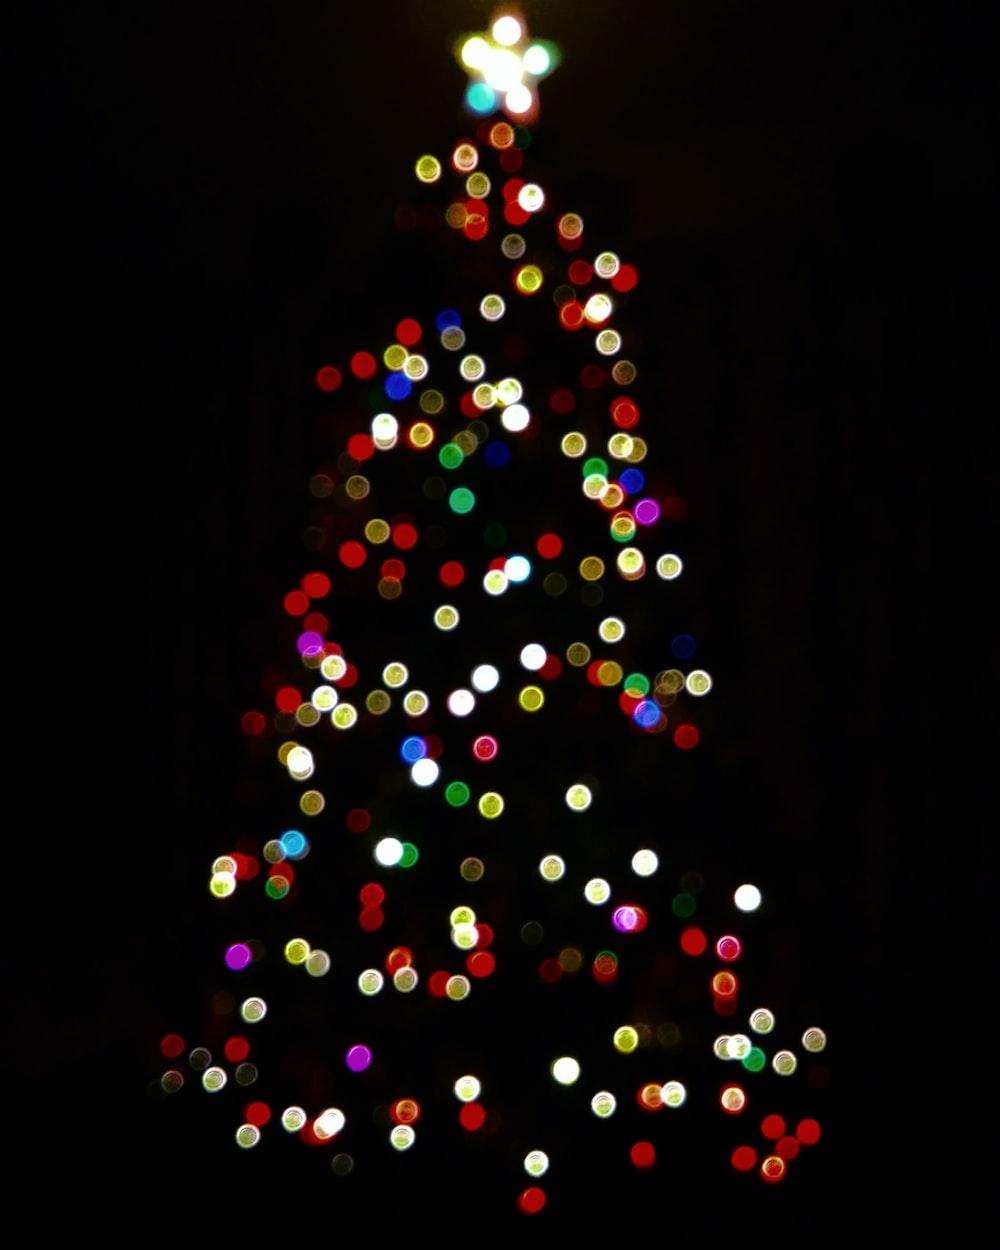 multicolored lighted Christmas tree